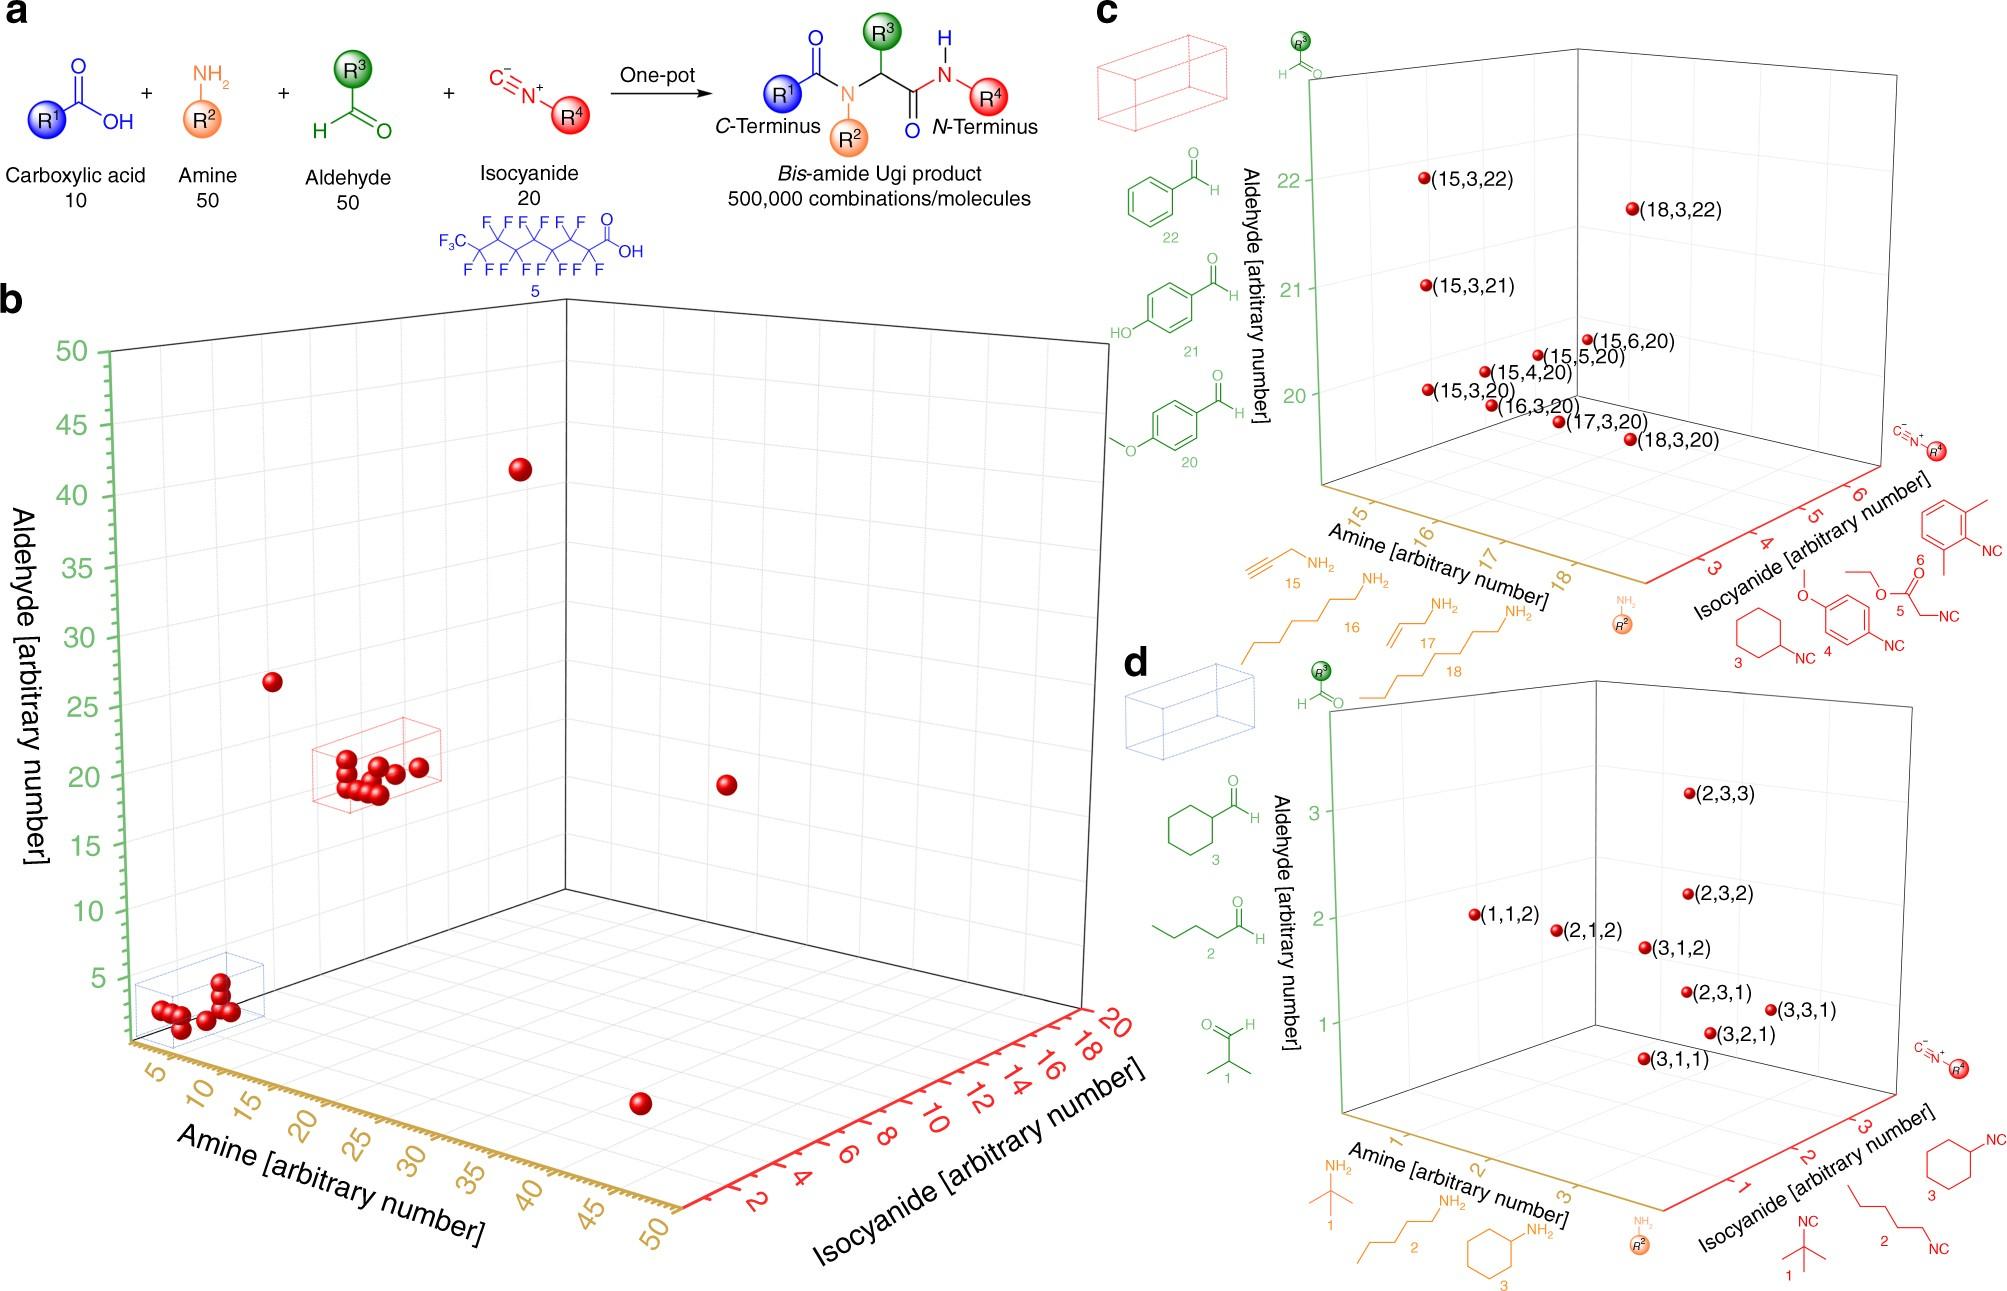 Multicomponent reactions provide key molecules for secret